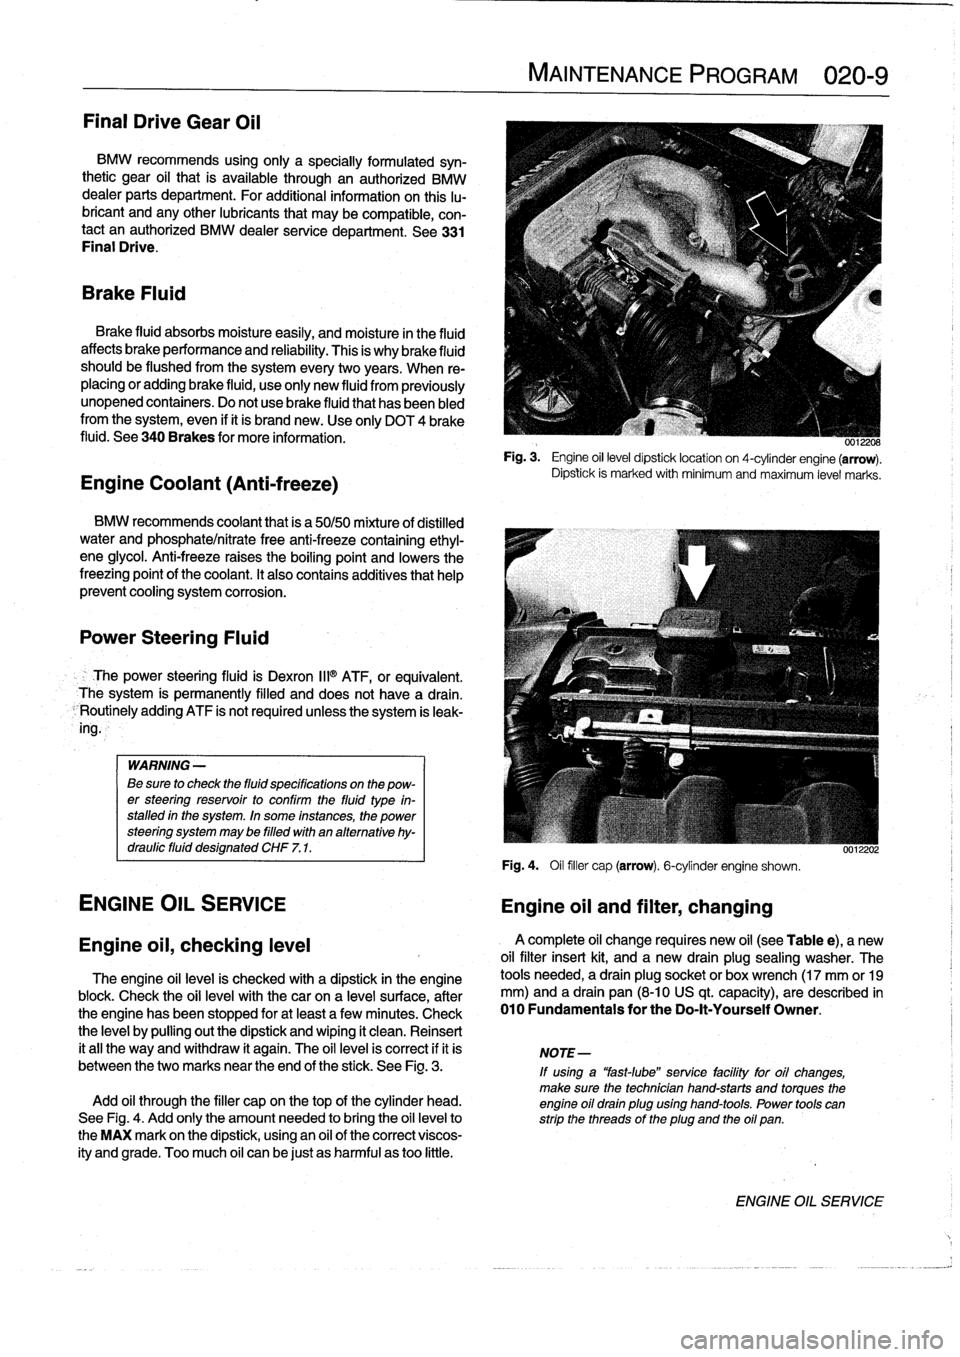 Bmw 325i 1997 E36 Workshop Manual Oil Drain Plug Location